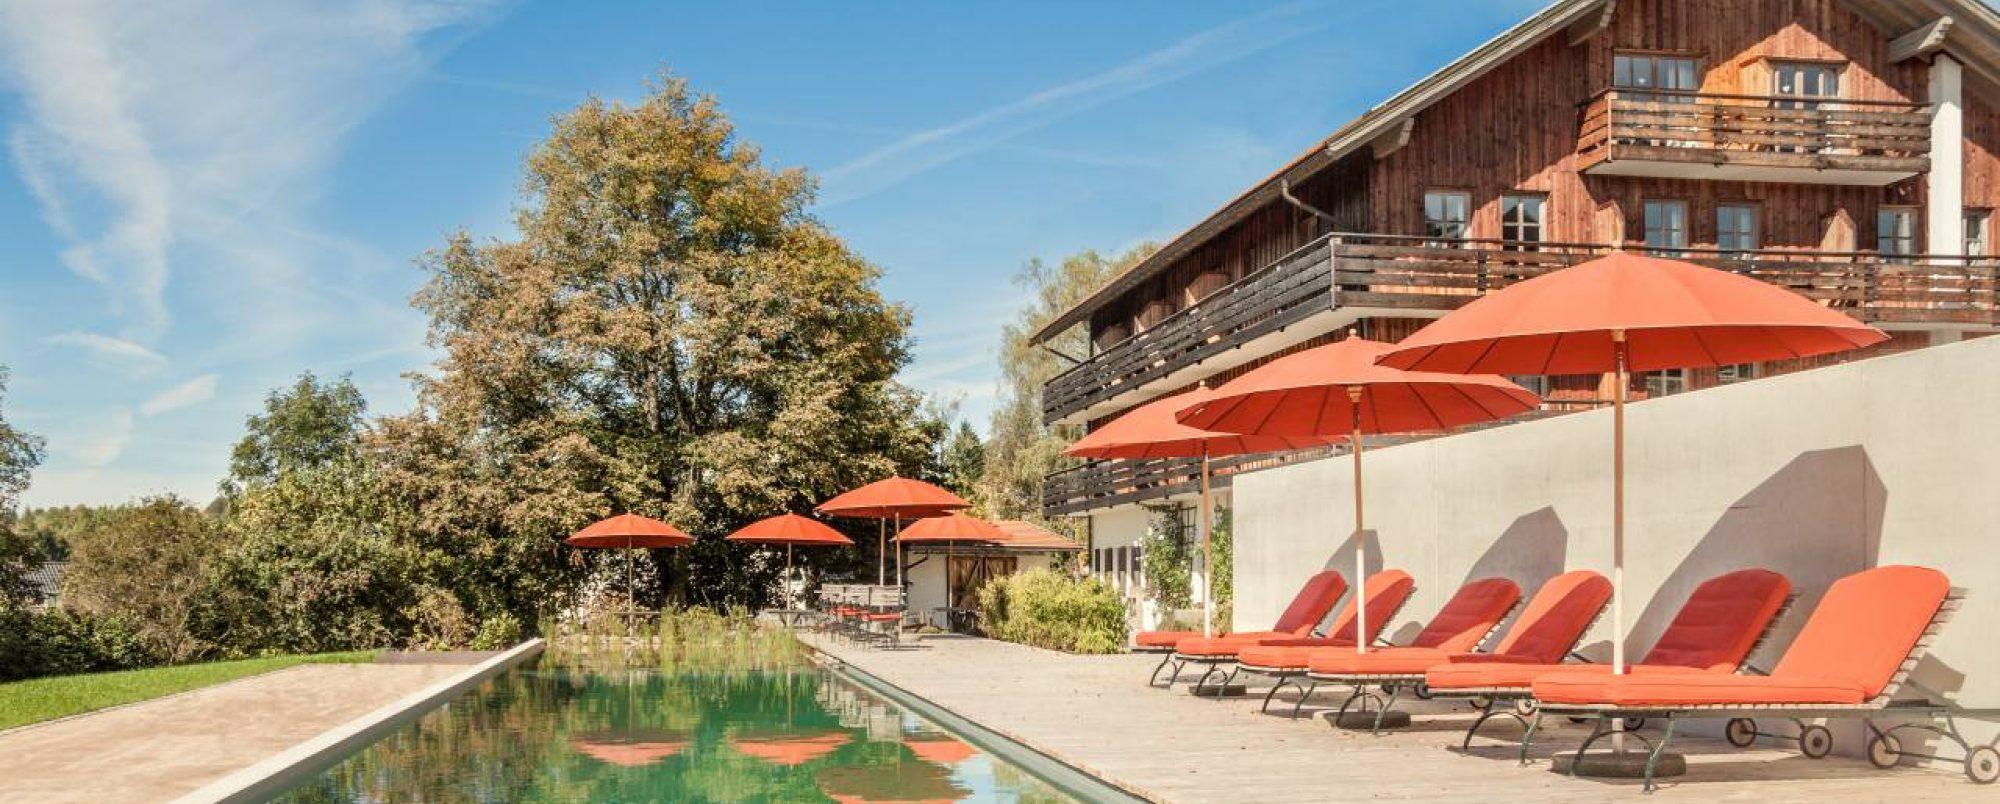 Poolbereich des Biohotels Pausnhof